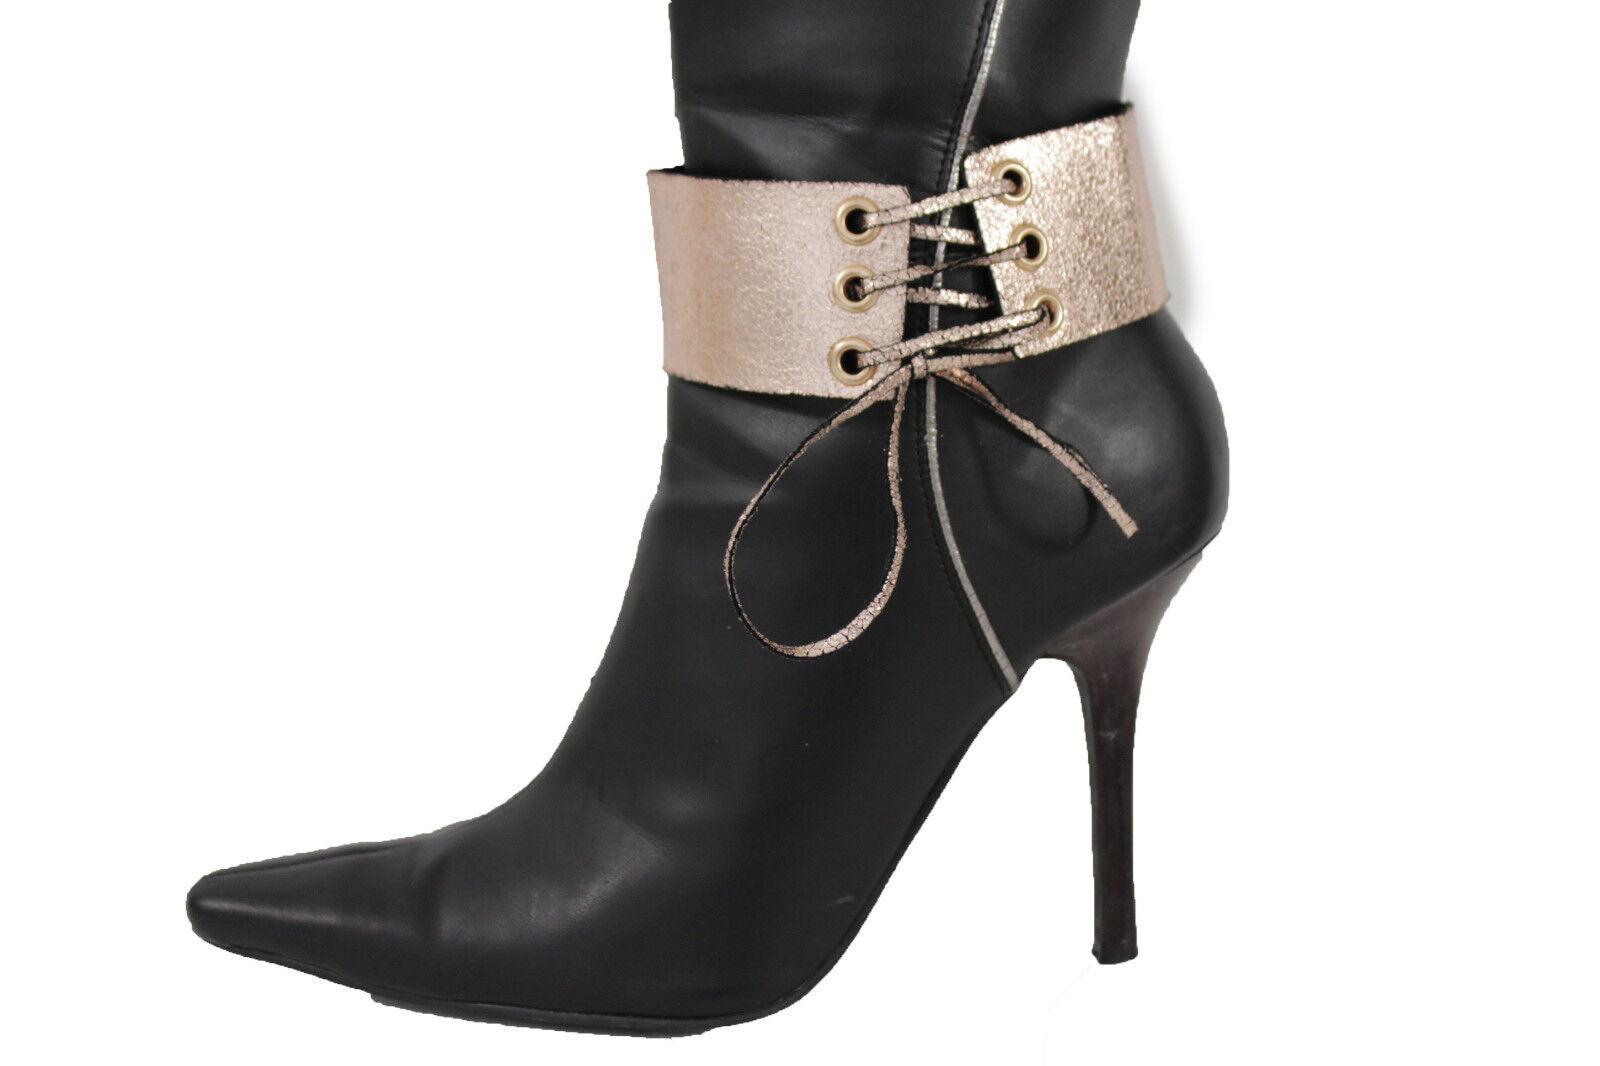 New Women Fashion Jewelry Boot Bracelet Corset Strap Metallic Copper Shoe Anklet